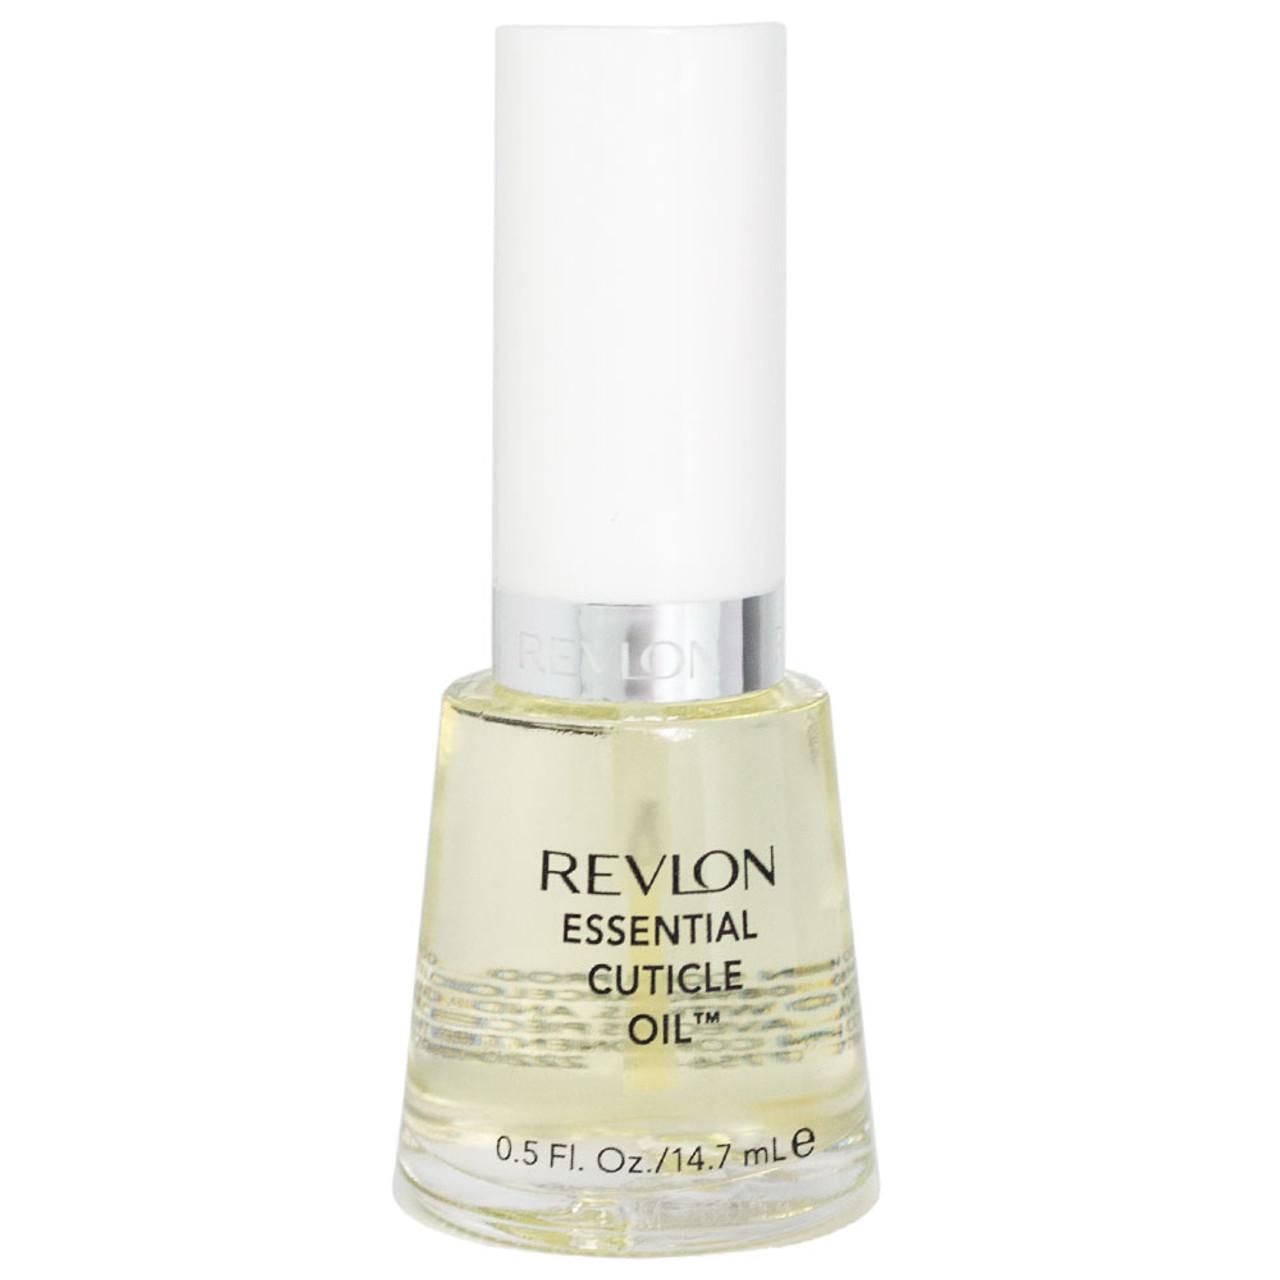 Revlon Essential Cuticle Oil, .5 fl. oz. - BuyMeBeauty.com